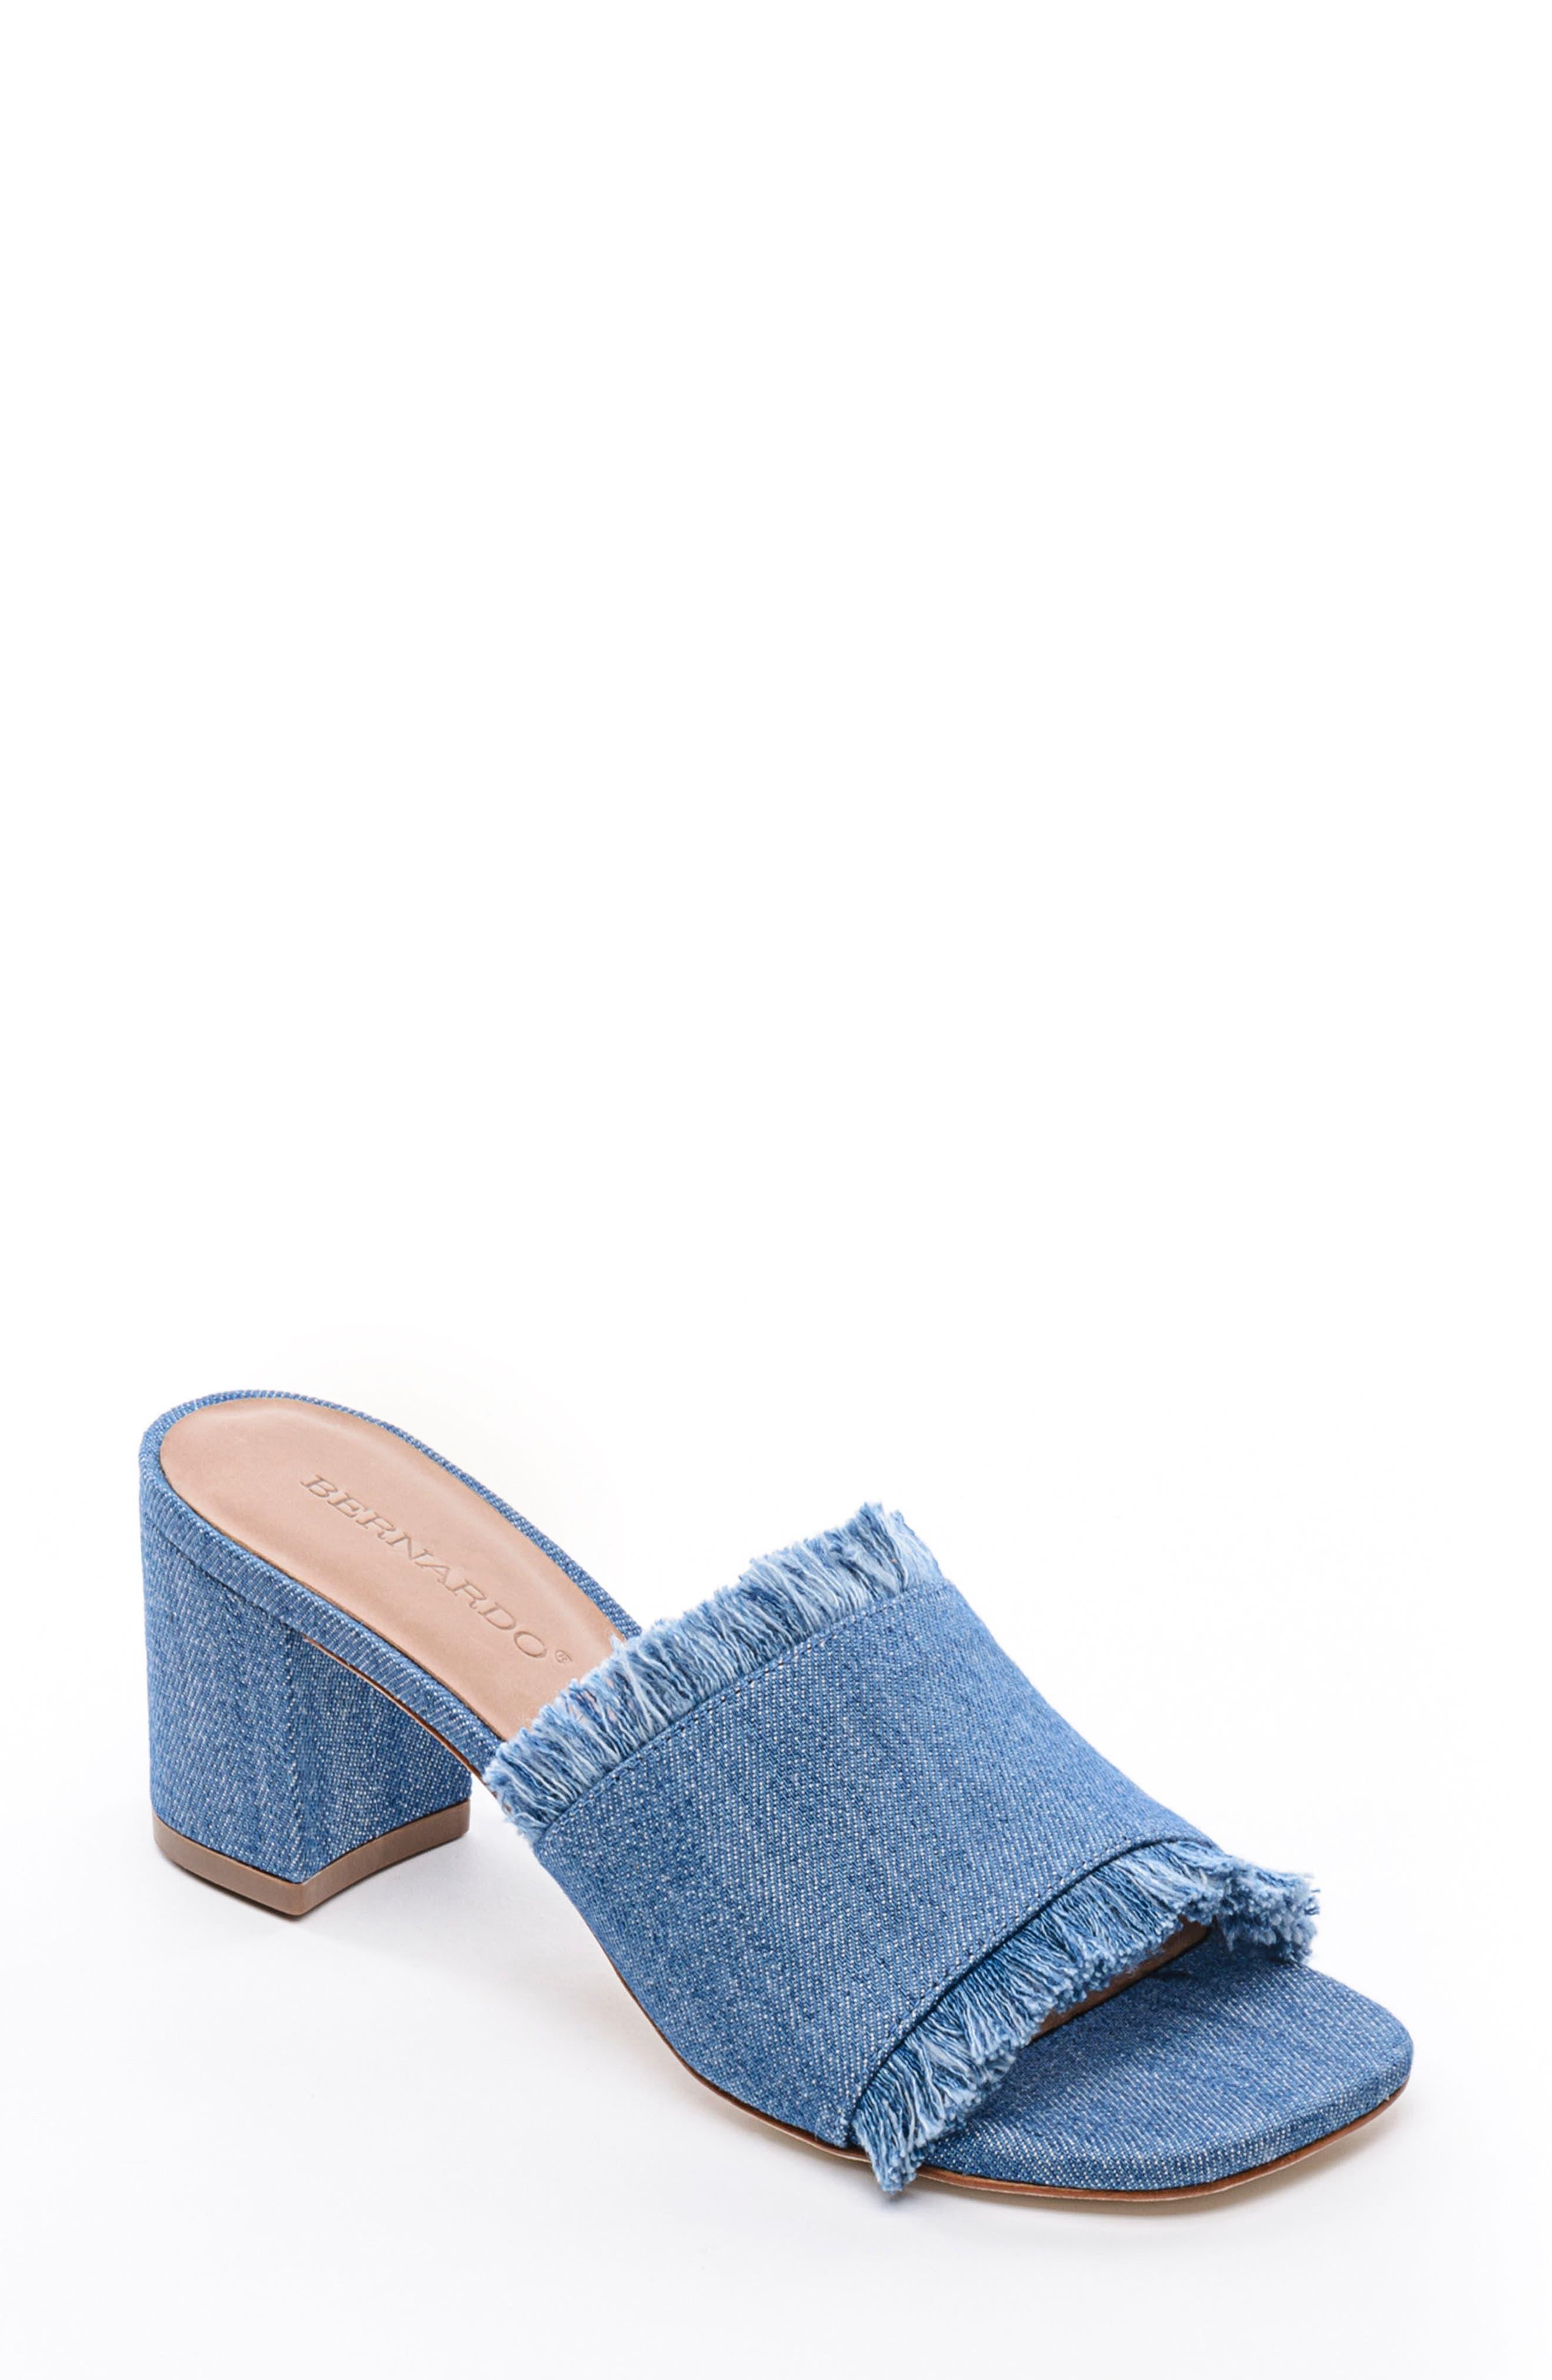 Bernardo Footwear Blair Fringe Mule (Women)